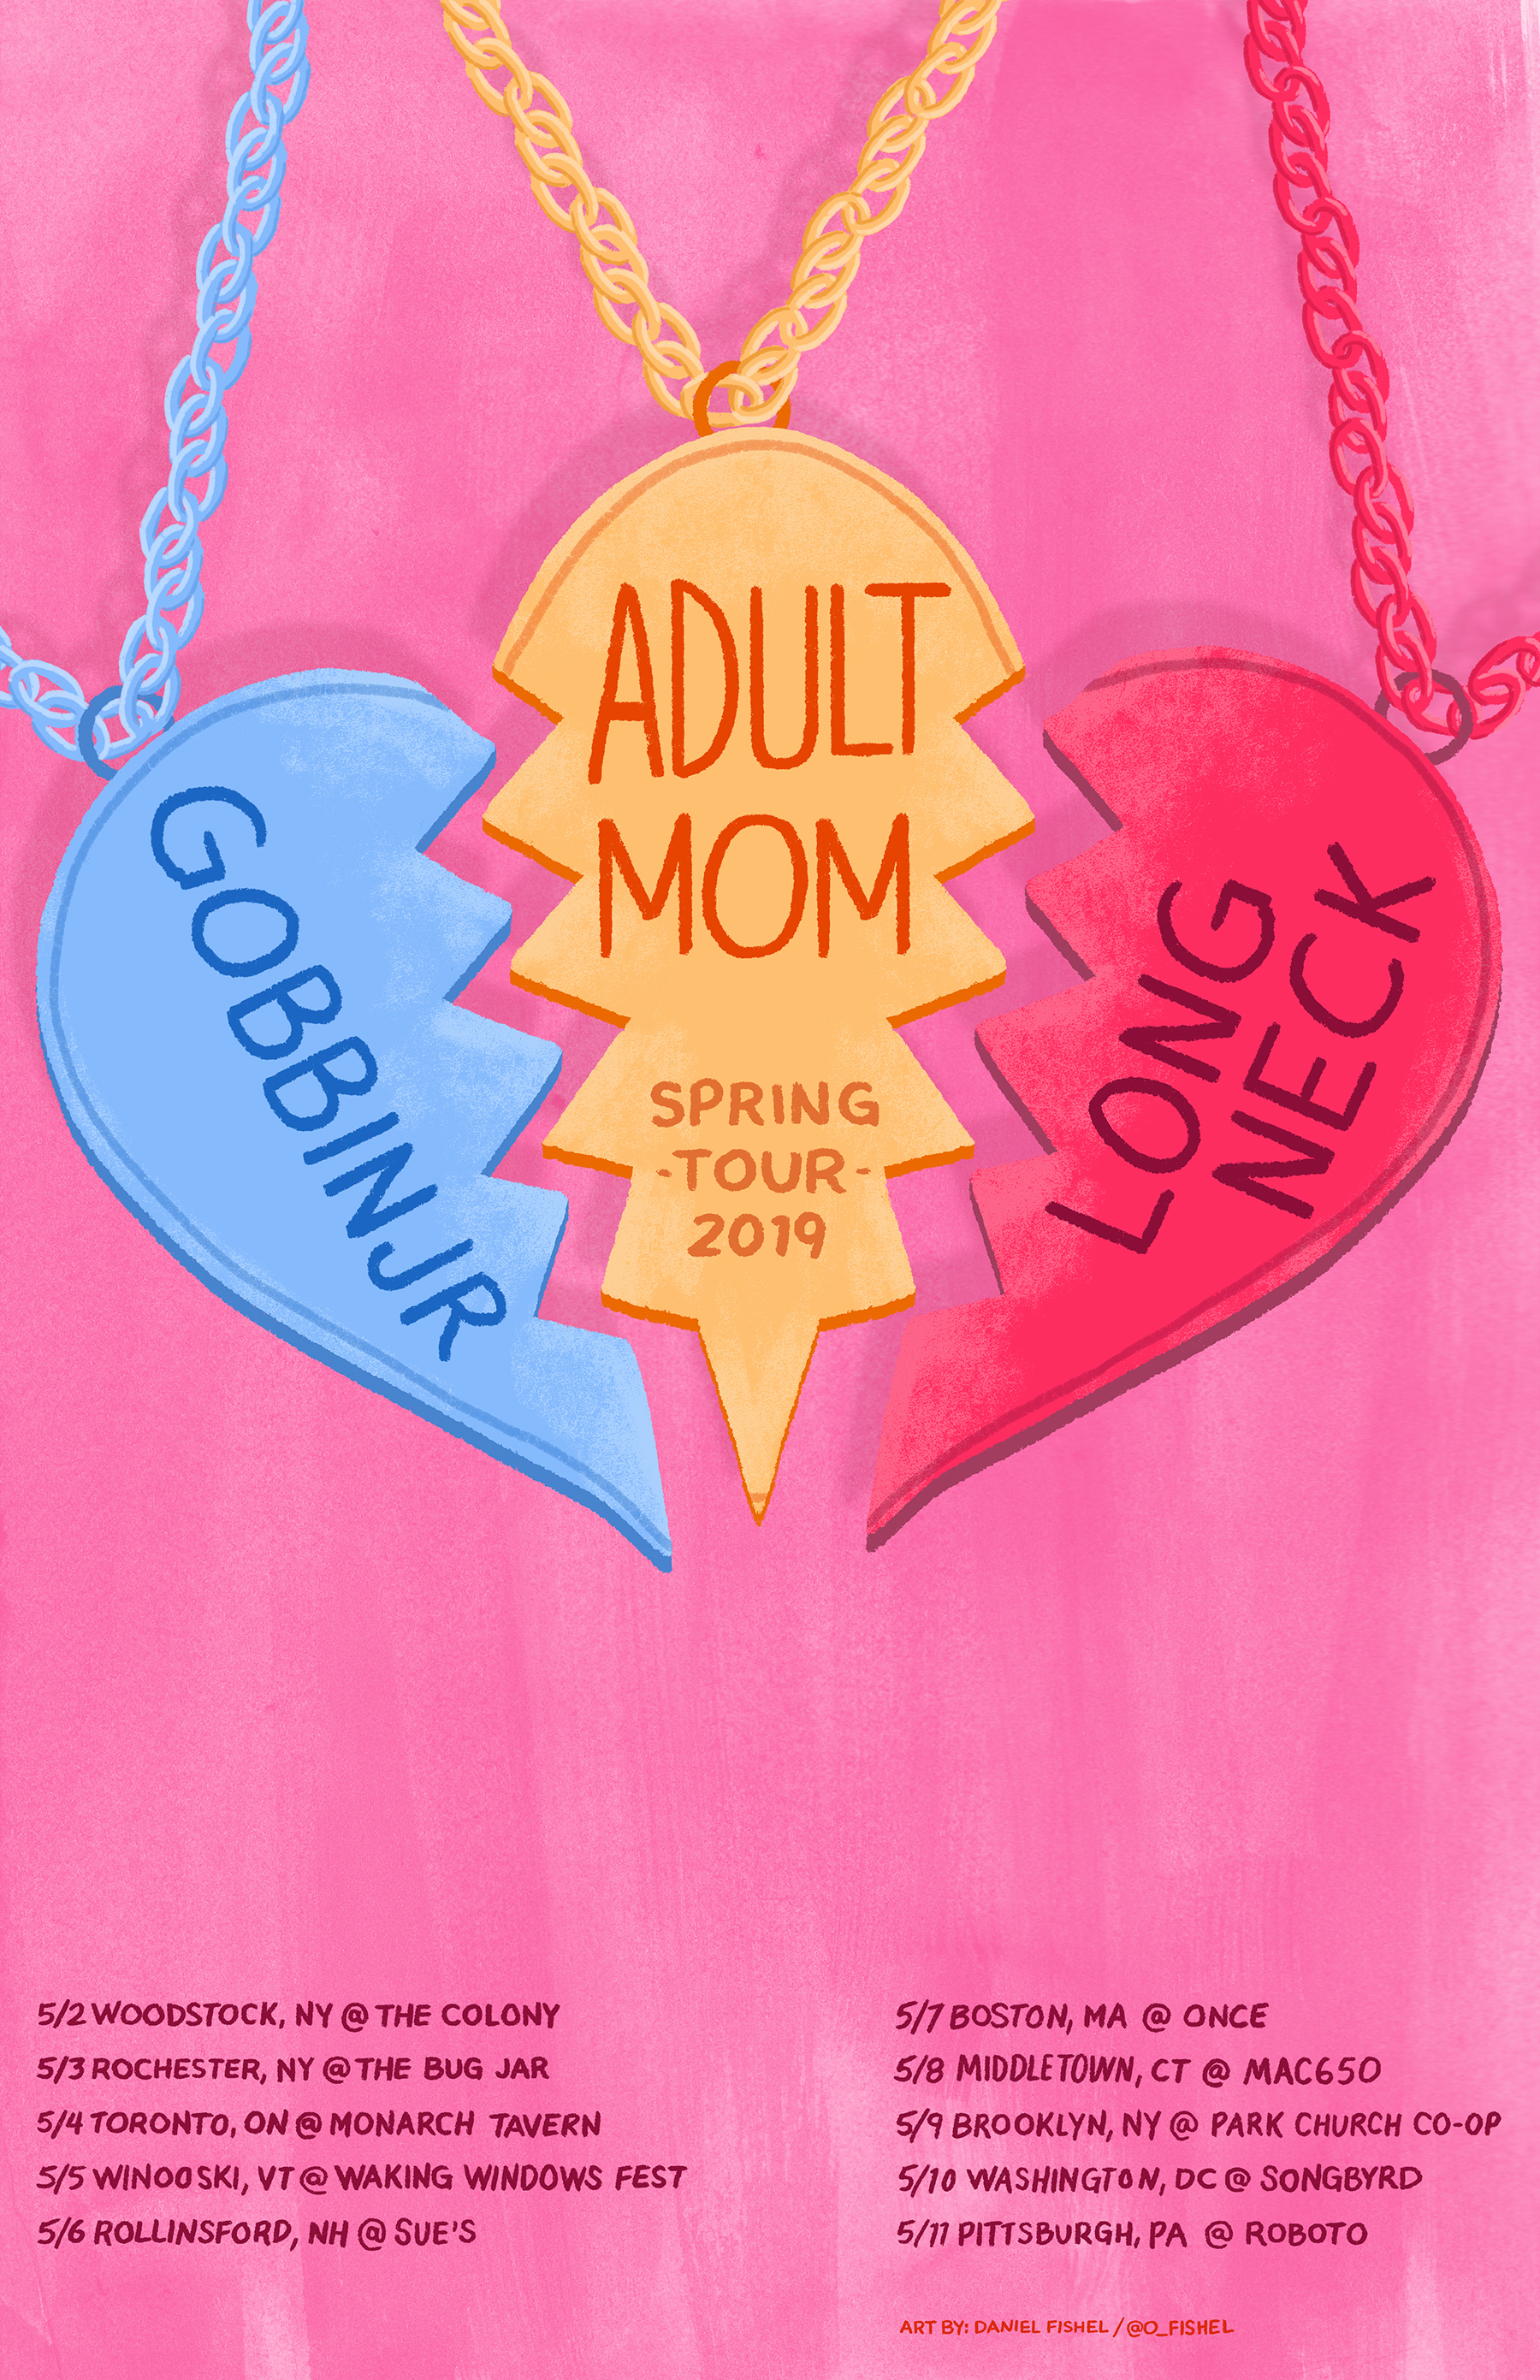 adultmom_poster_Web_03_01.jpg